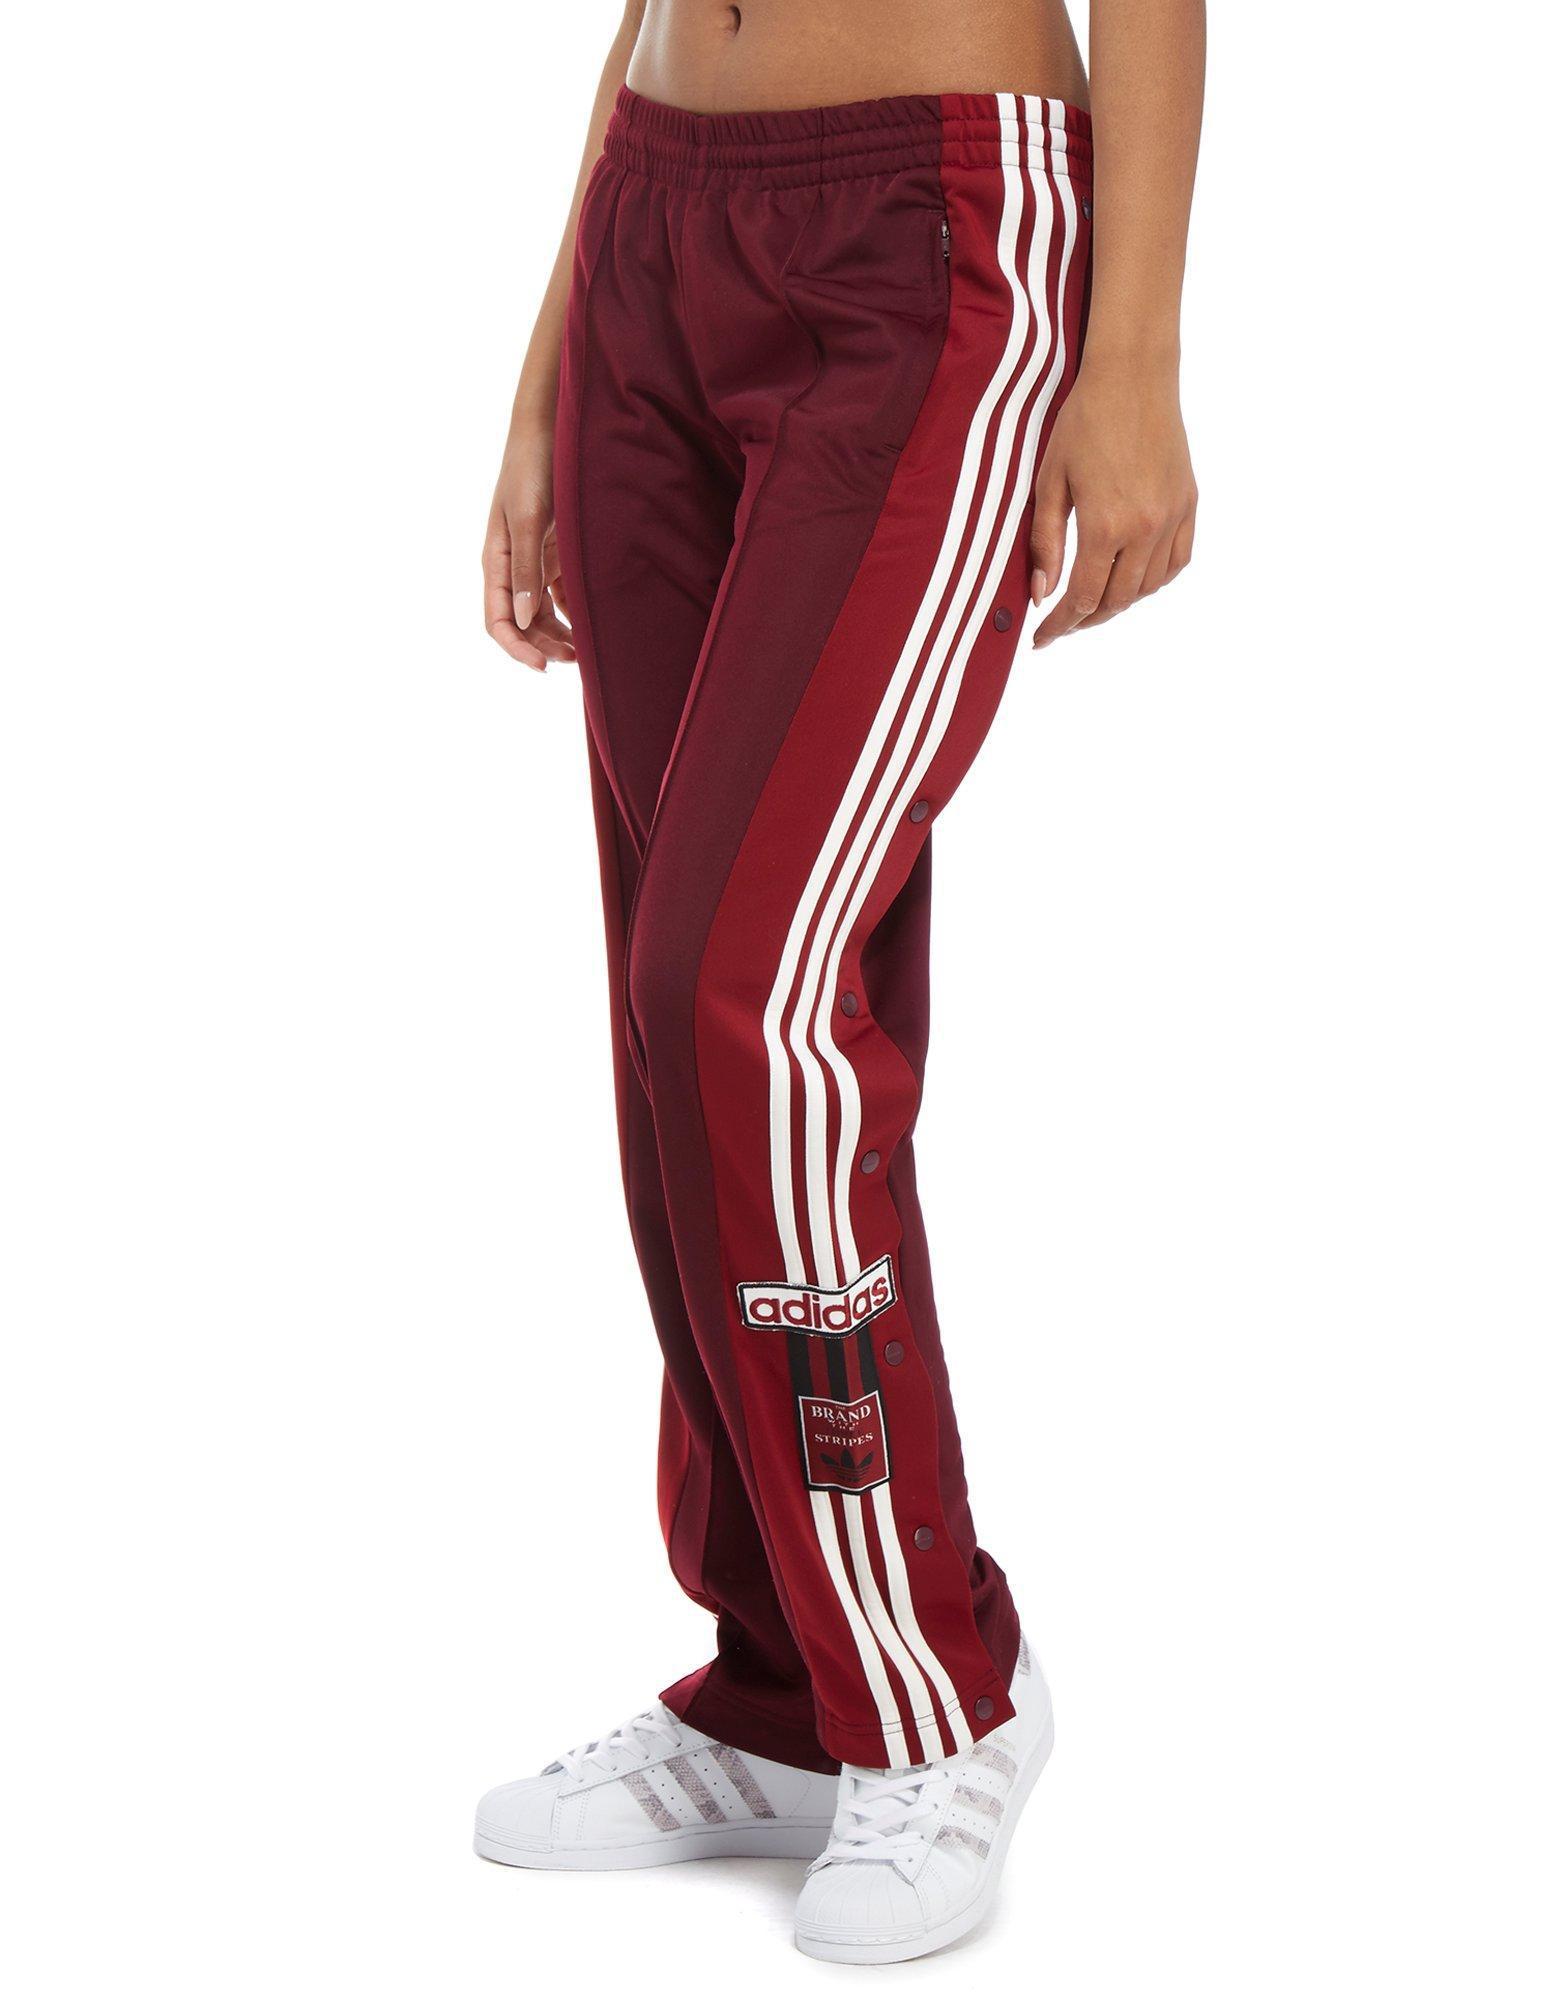 aa25f44f4 adidas Originals Adibreak Track Pants in Red - Lyst